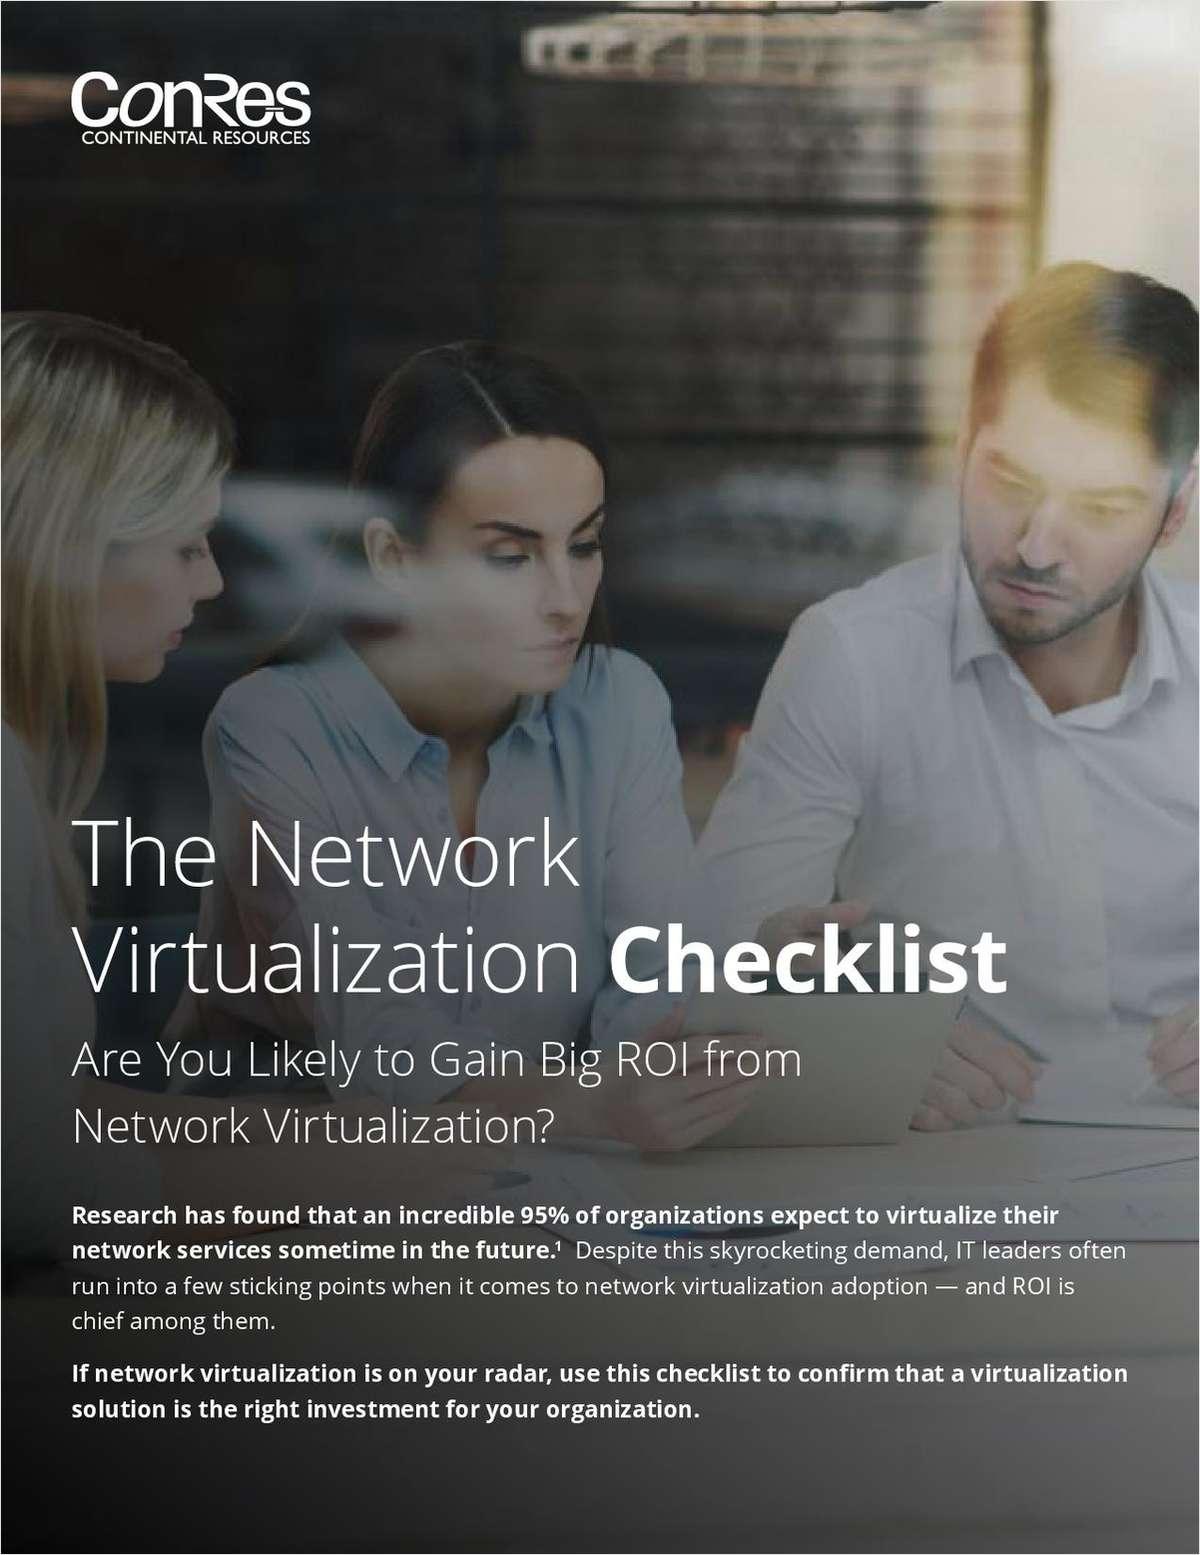 The Network Virtualization Checklist